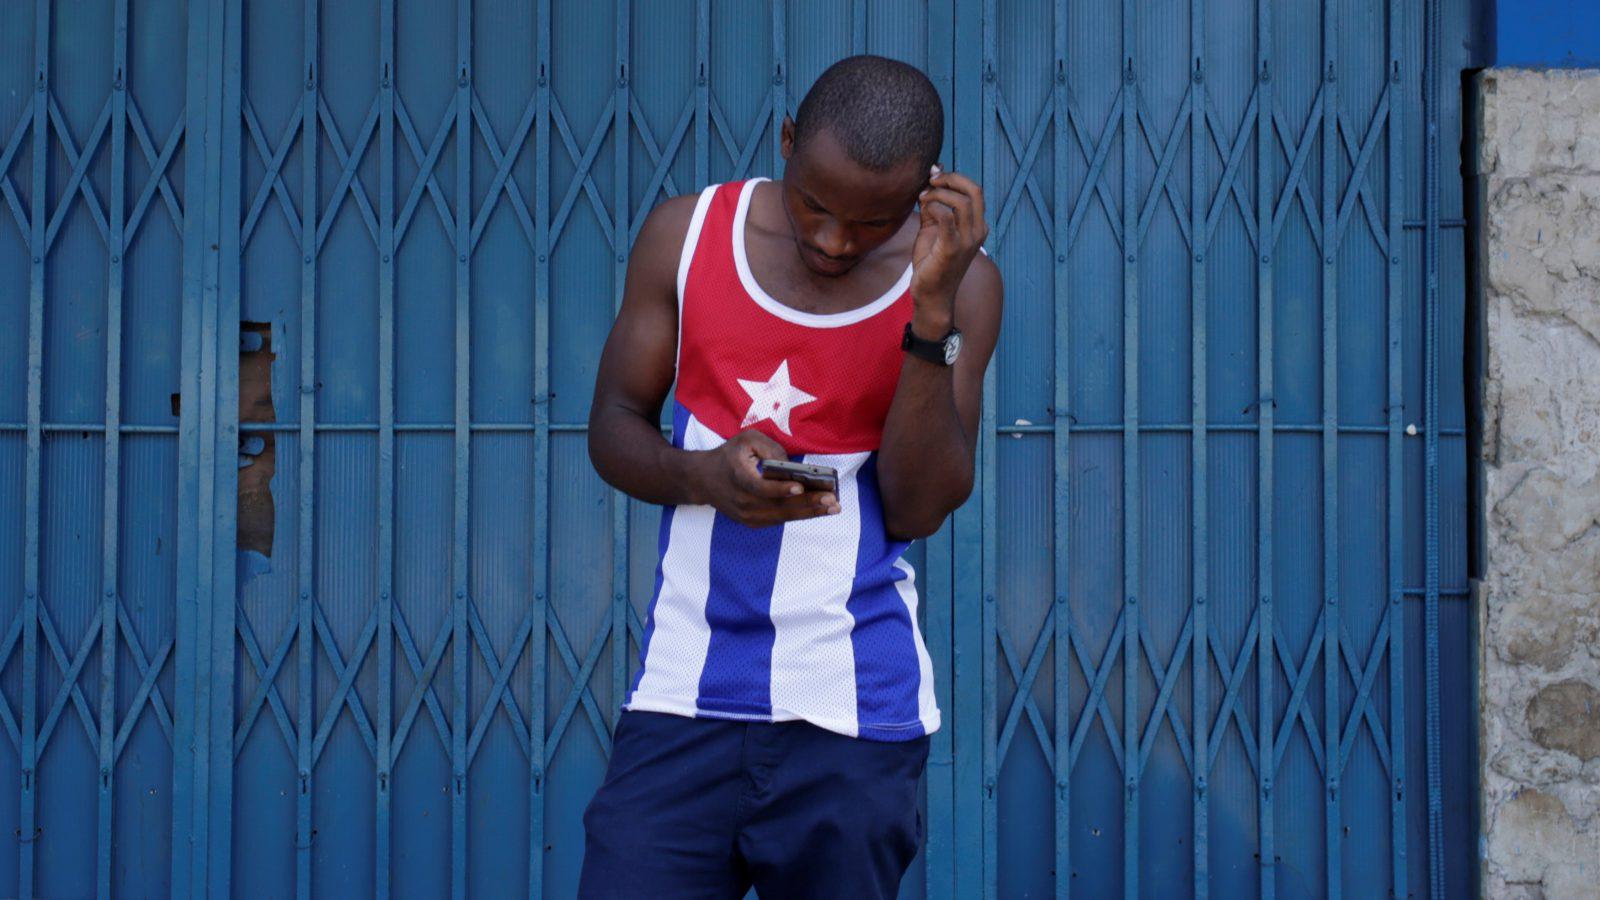 A man uses the internet via public Wi-Fi in Havana, Cuba, September 5, 2016. REUTERS/Enrique de la Osa     TPX IMAGES OF THE DAY      - RTX2O94J